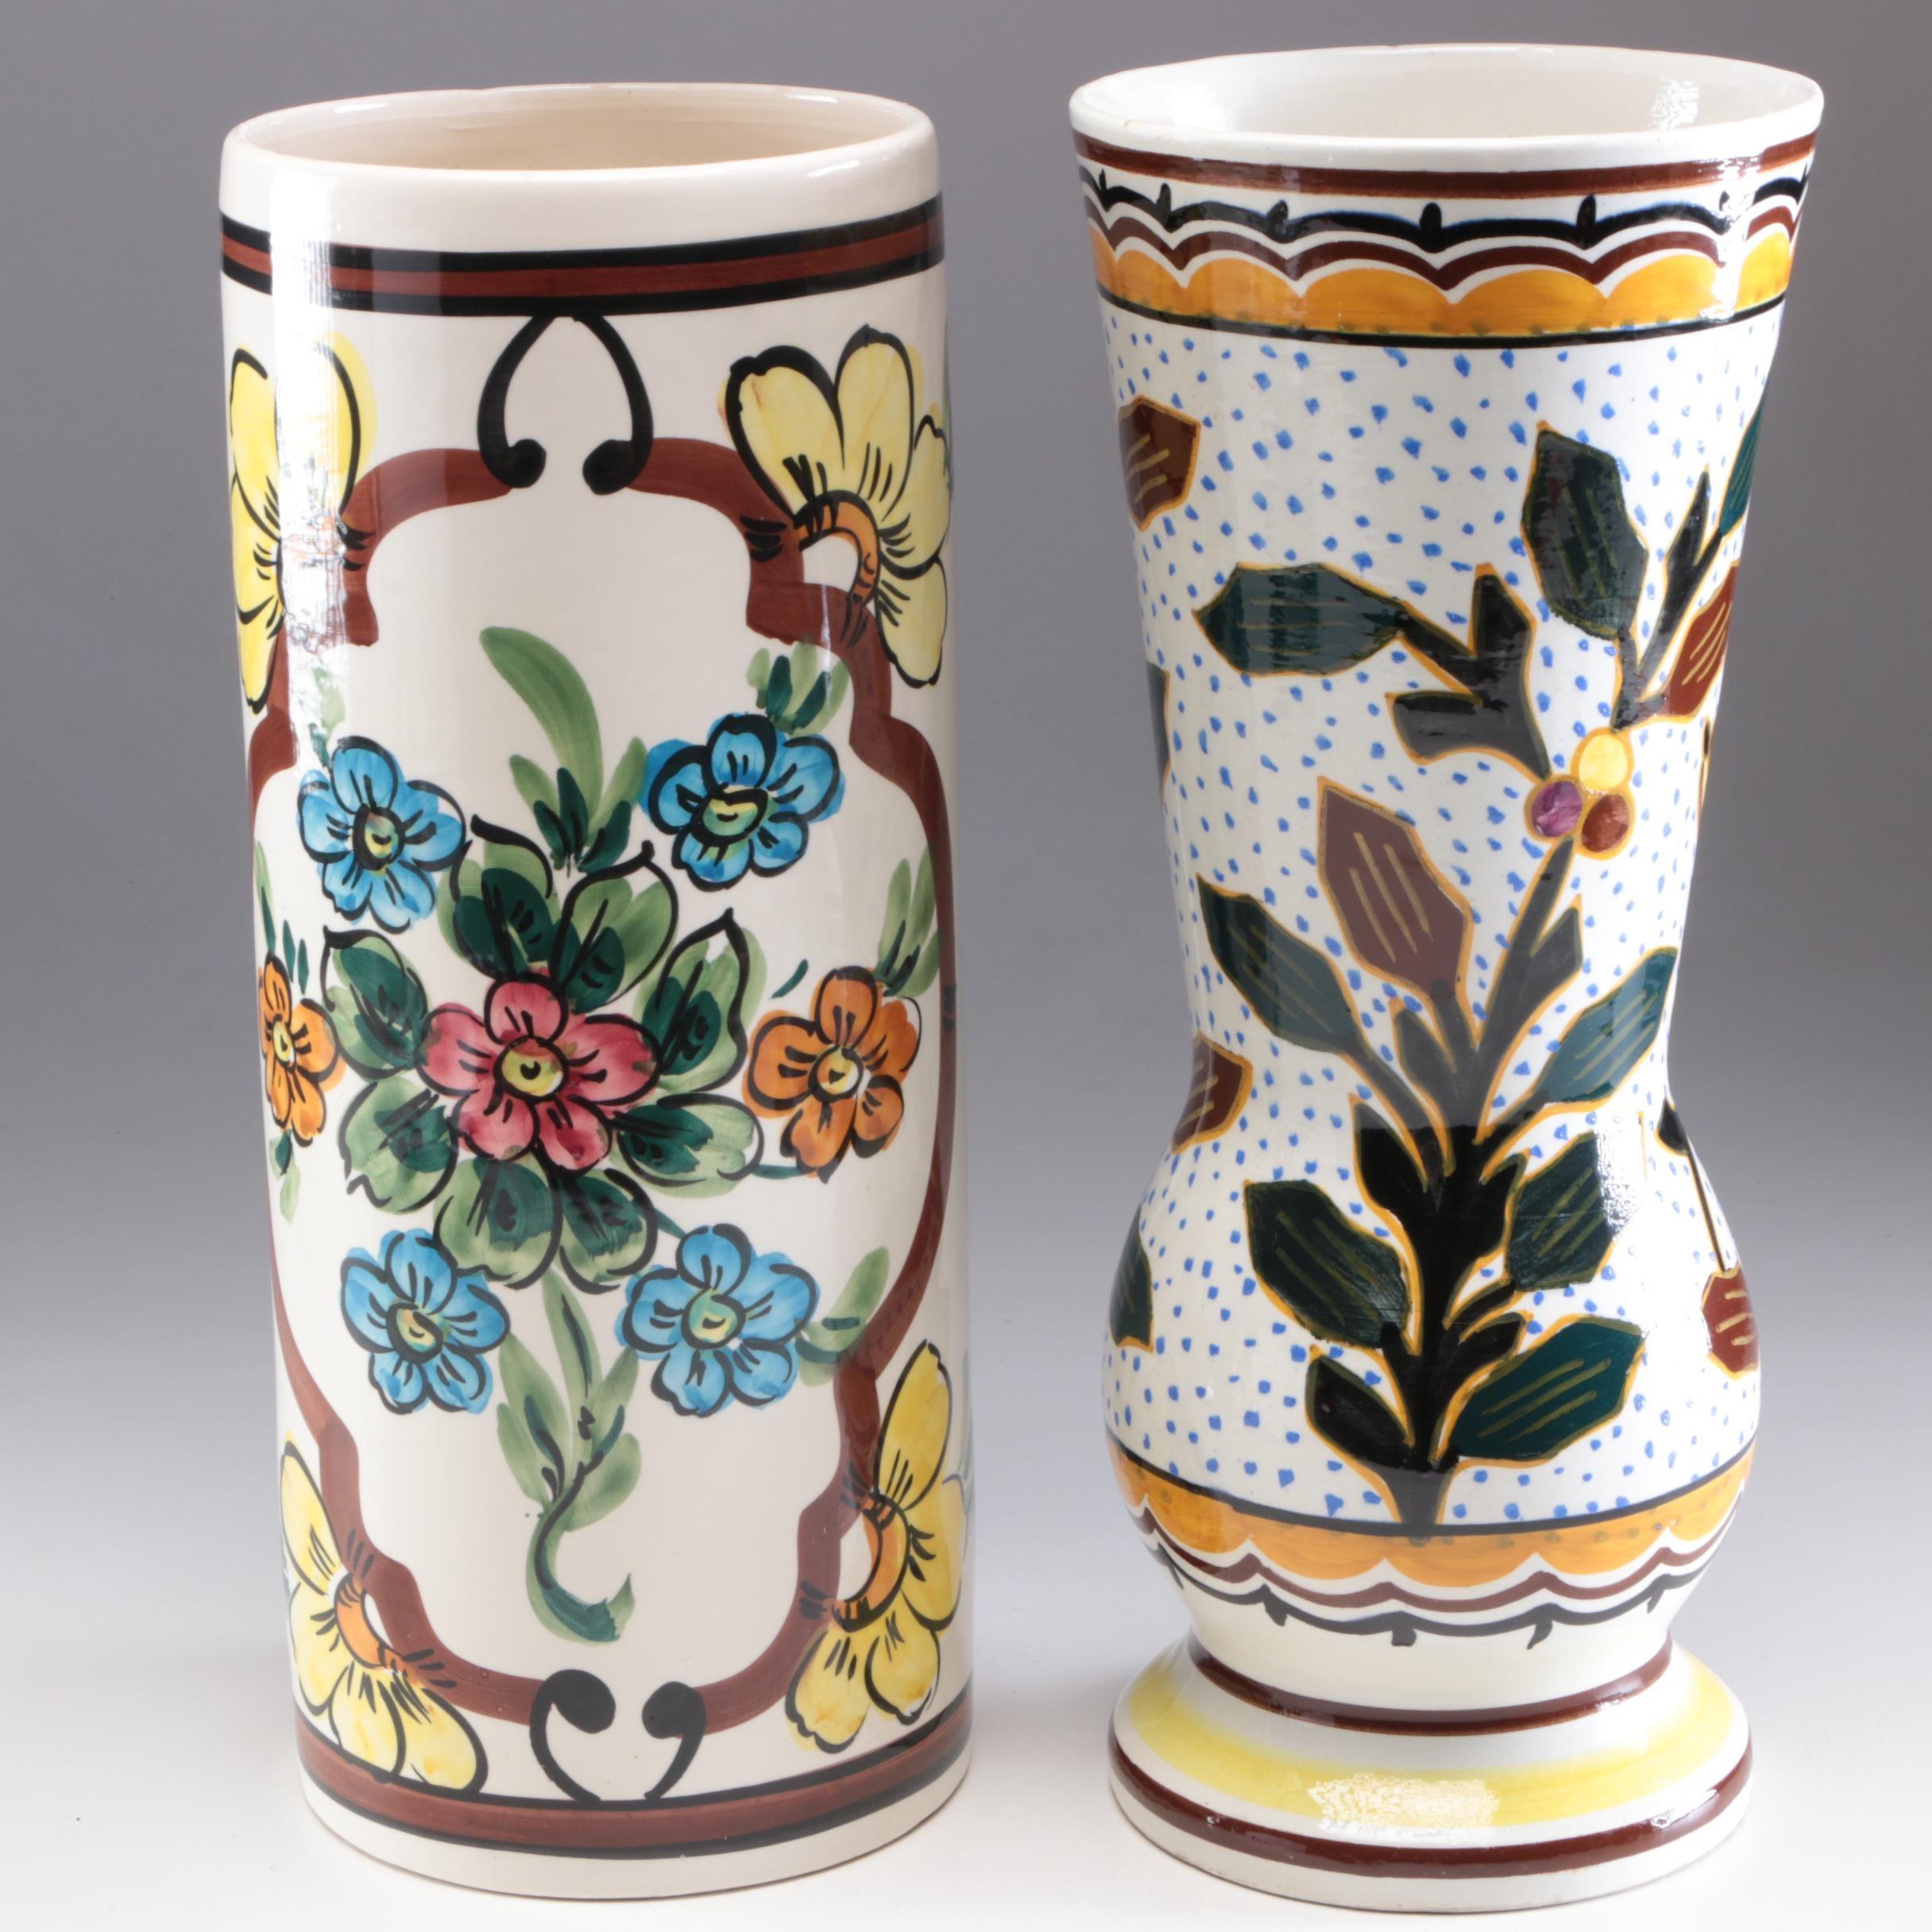 Hand-Painted Spanish Ceramic Vases, Mid-Century